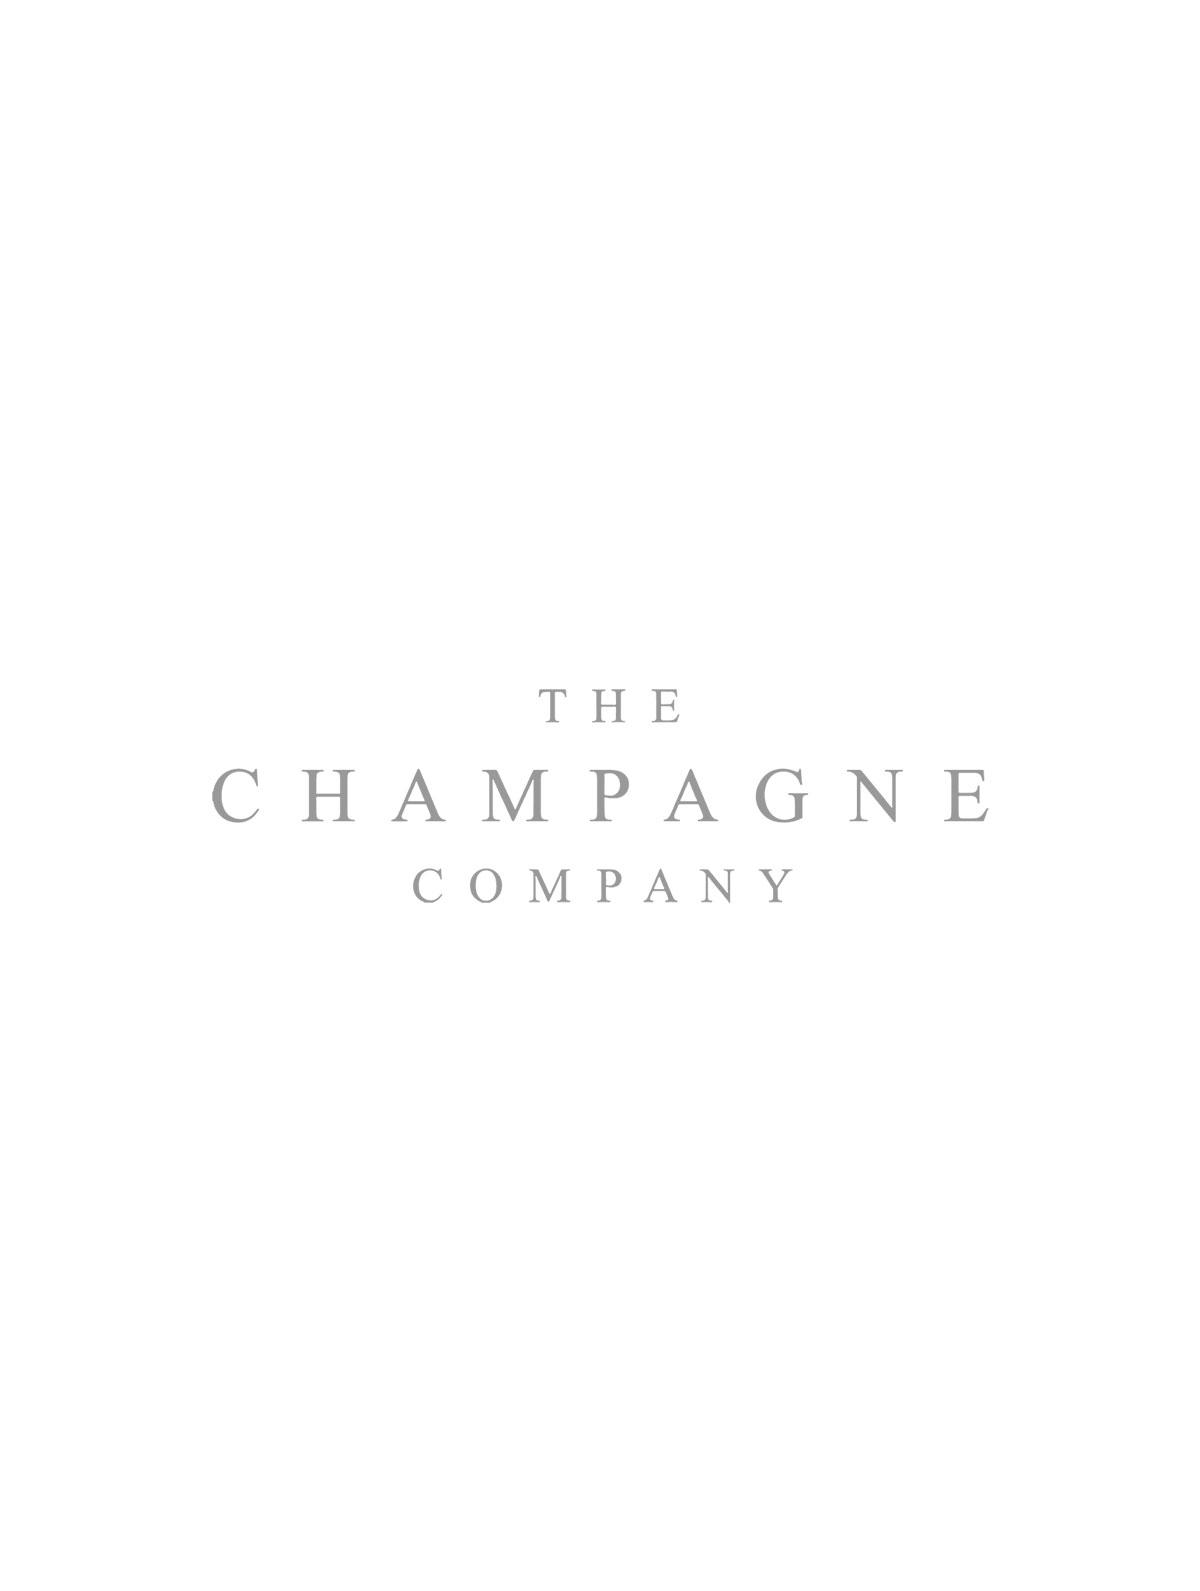 Lanson Black Label Champagne Brut NV Case Deal 24 x 20cl